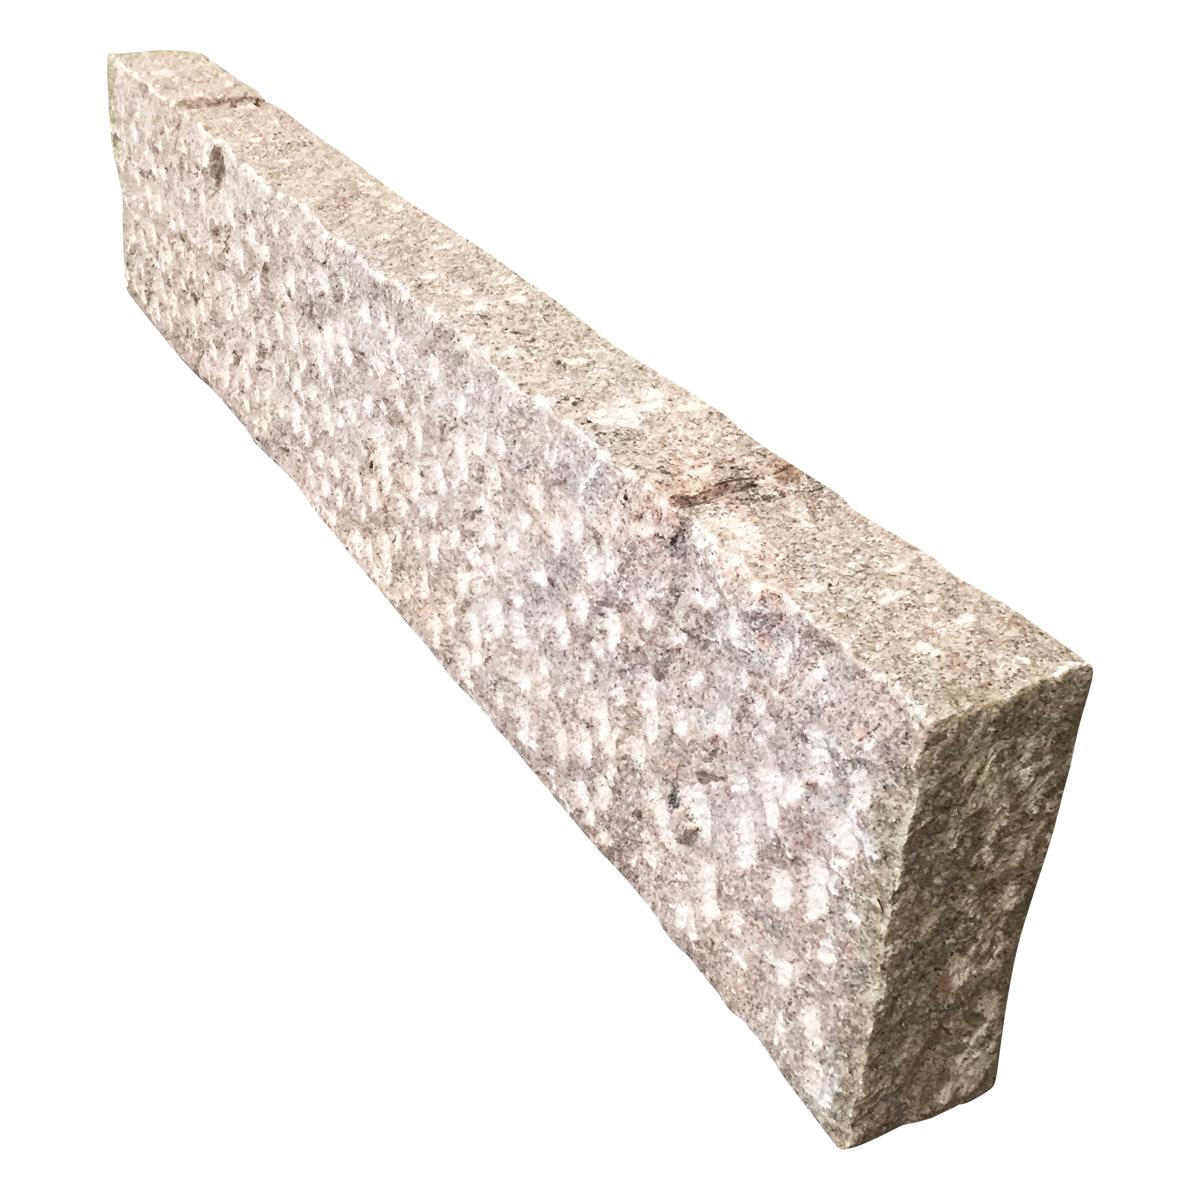 kantsten granit